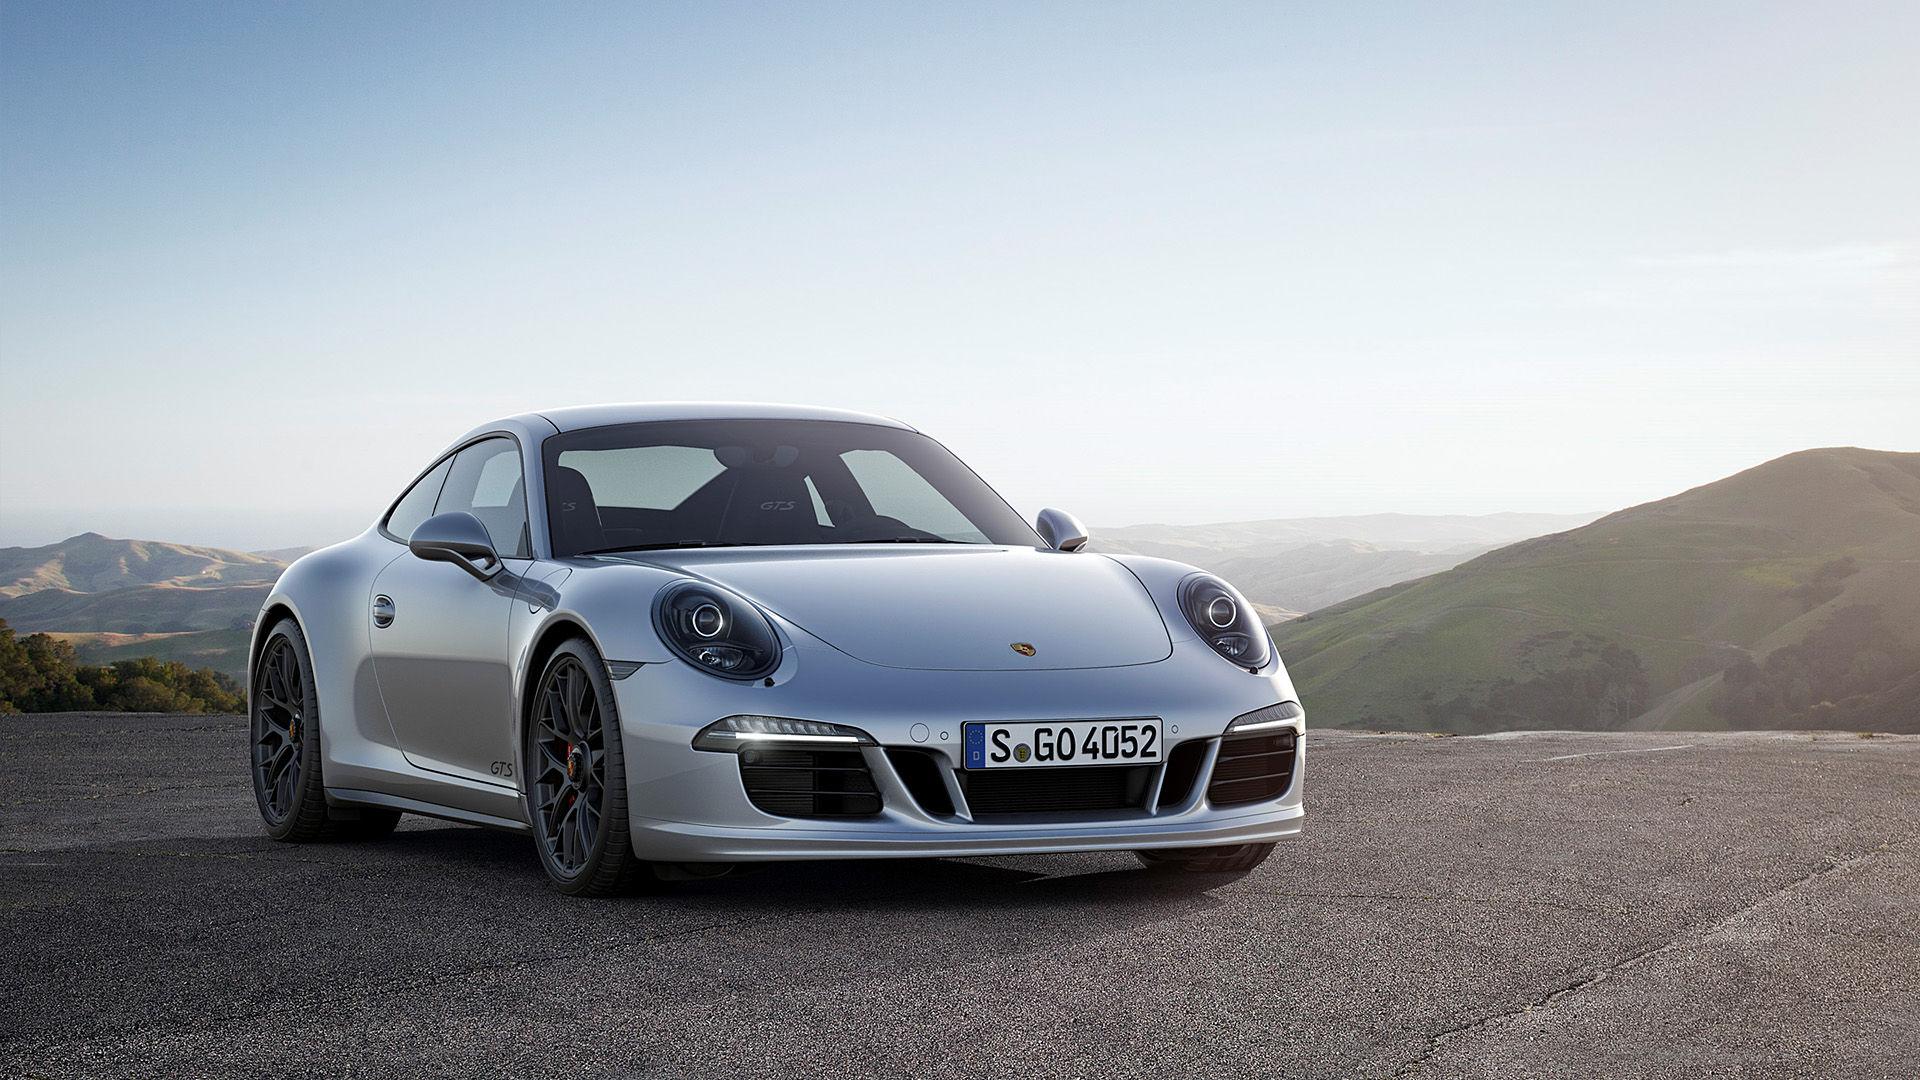 2015 Porsche 911 Carrera GTS